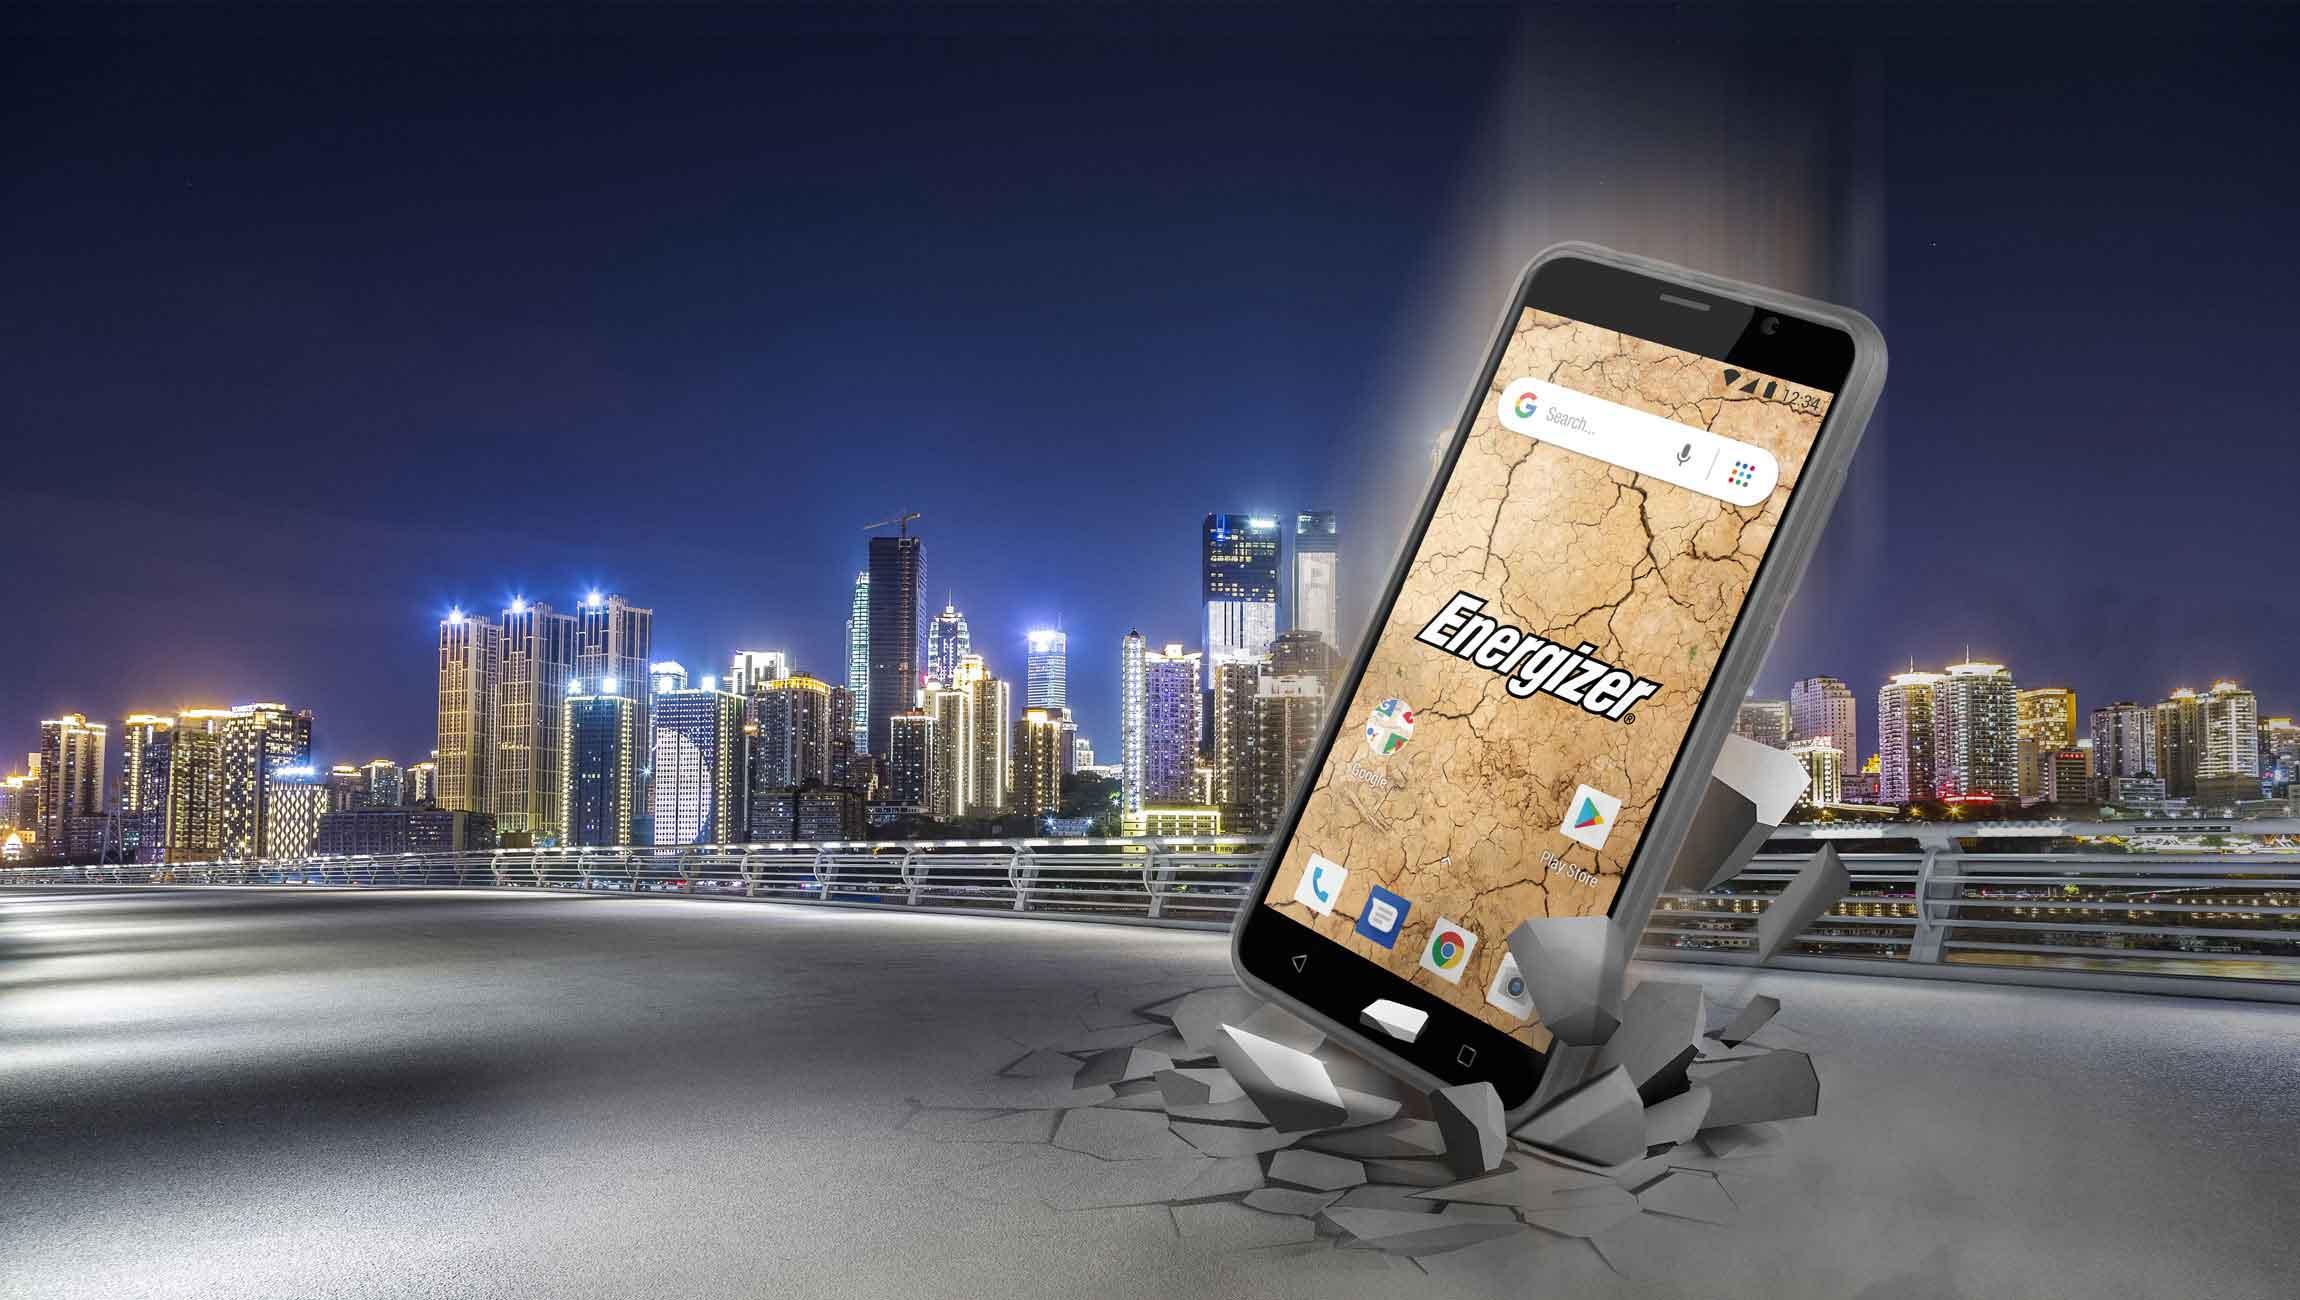 AT E500S cover - گوشی موبایل انرجایزر مدل Energizer Energy E500S با ظرفیت ۸ گیگابایت